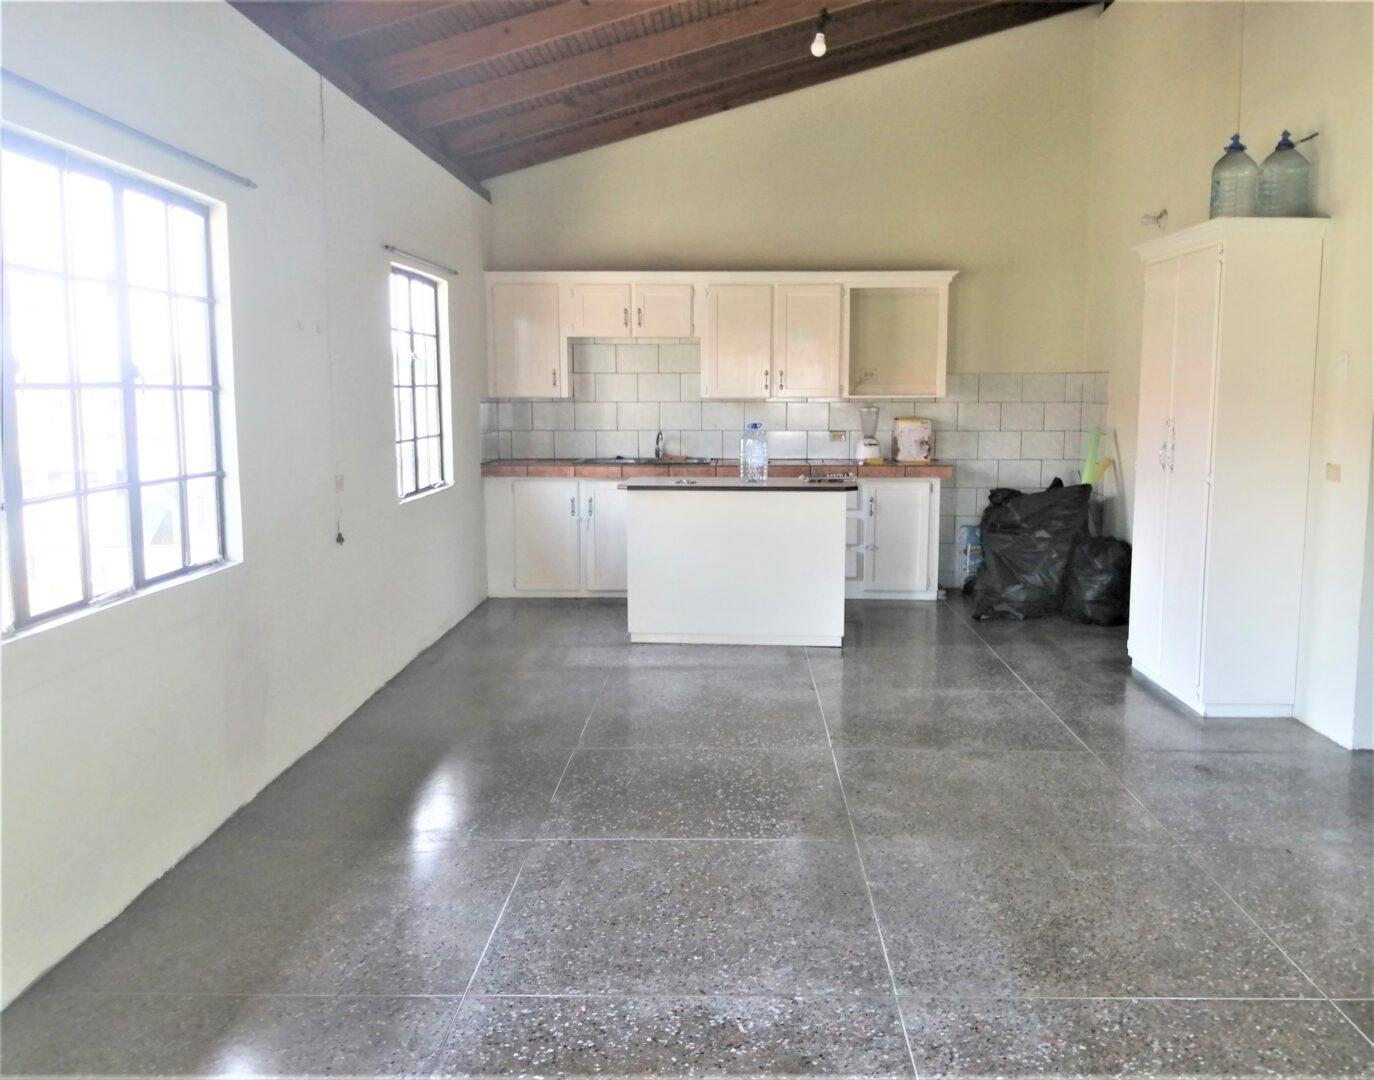 2 Bedrooms – Spacious – Curepe – $3,000